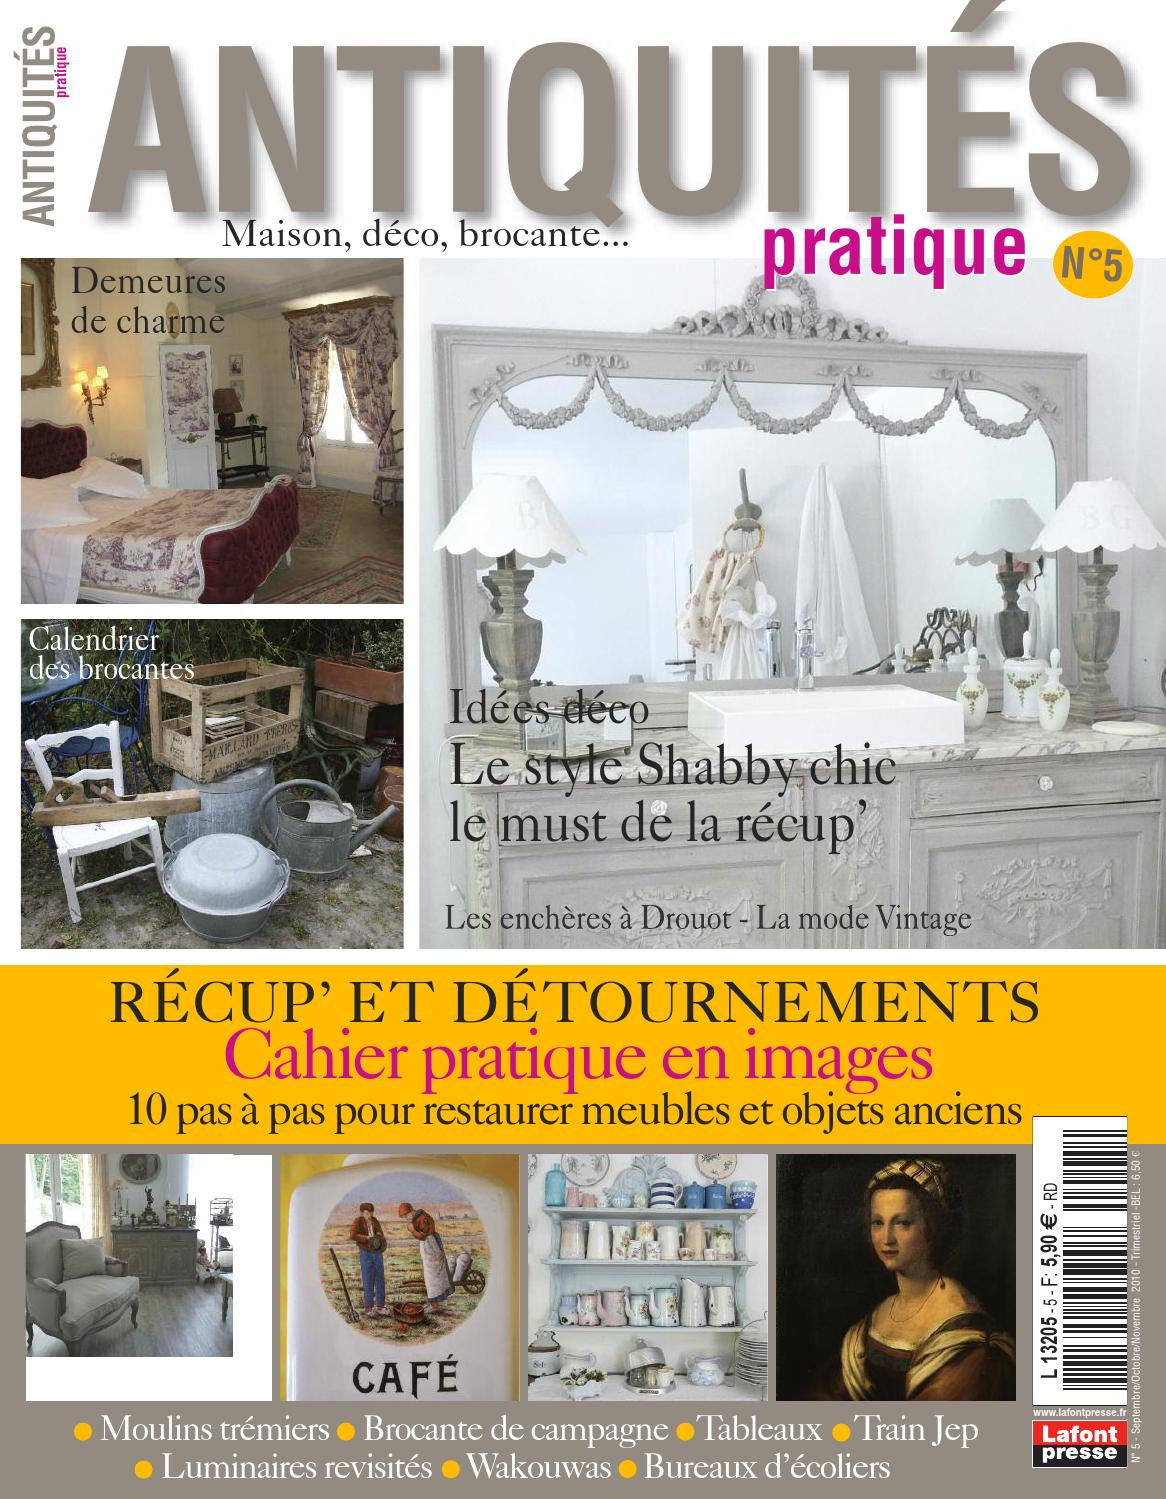 antiquites pratique 5 by fabien tourneur issuu. Black Bedroom Furniture Sets. Home Design Ideas